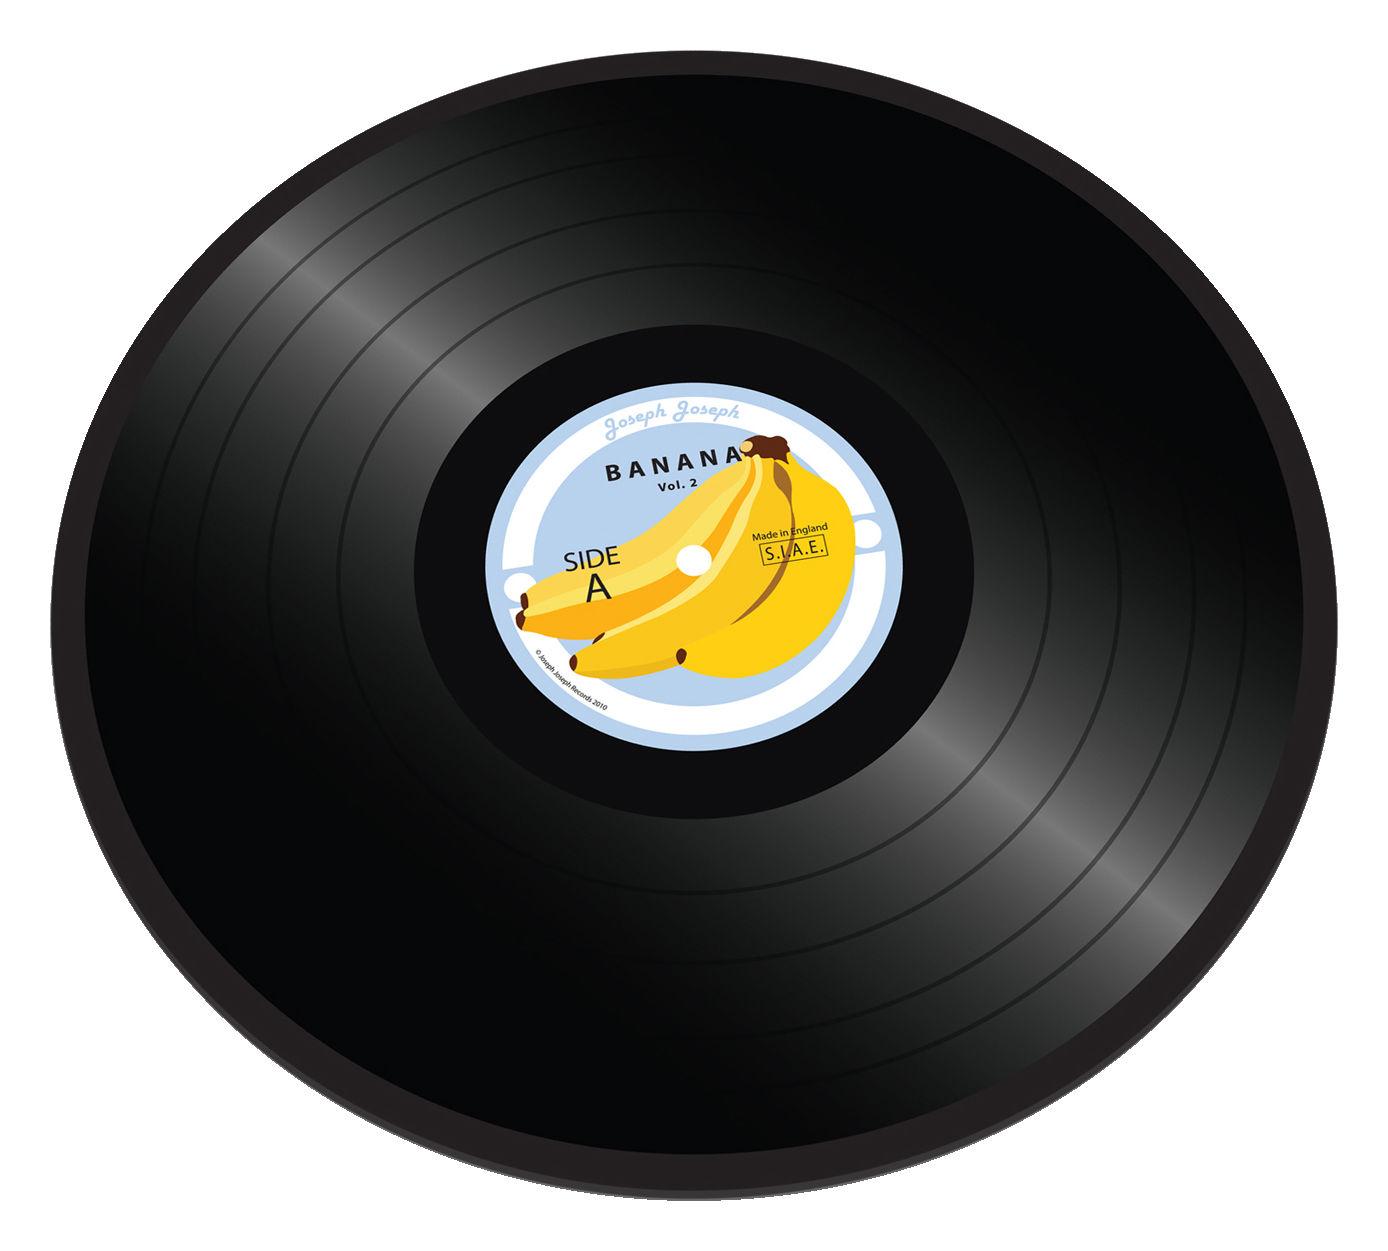 Tischkultur - Tabletts - Banana vinyl Schneidebrett Untersetzer / Teller - Joseph Joseph - Banana Vinyl - Glas